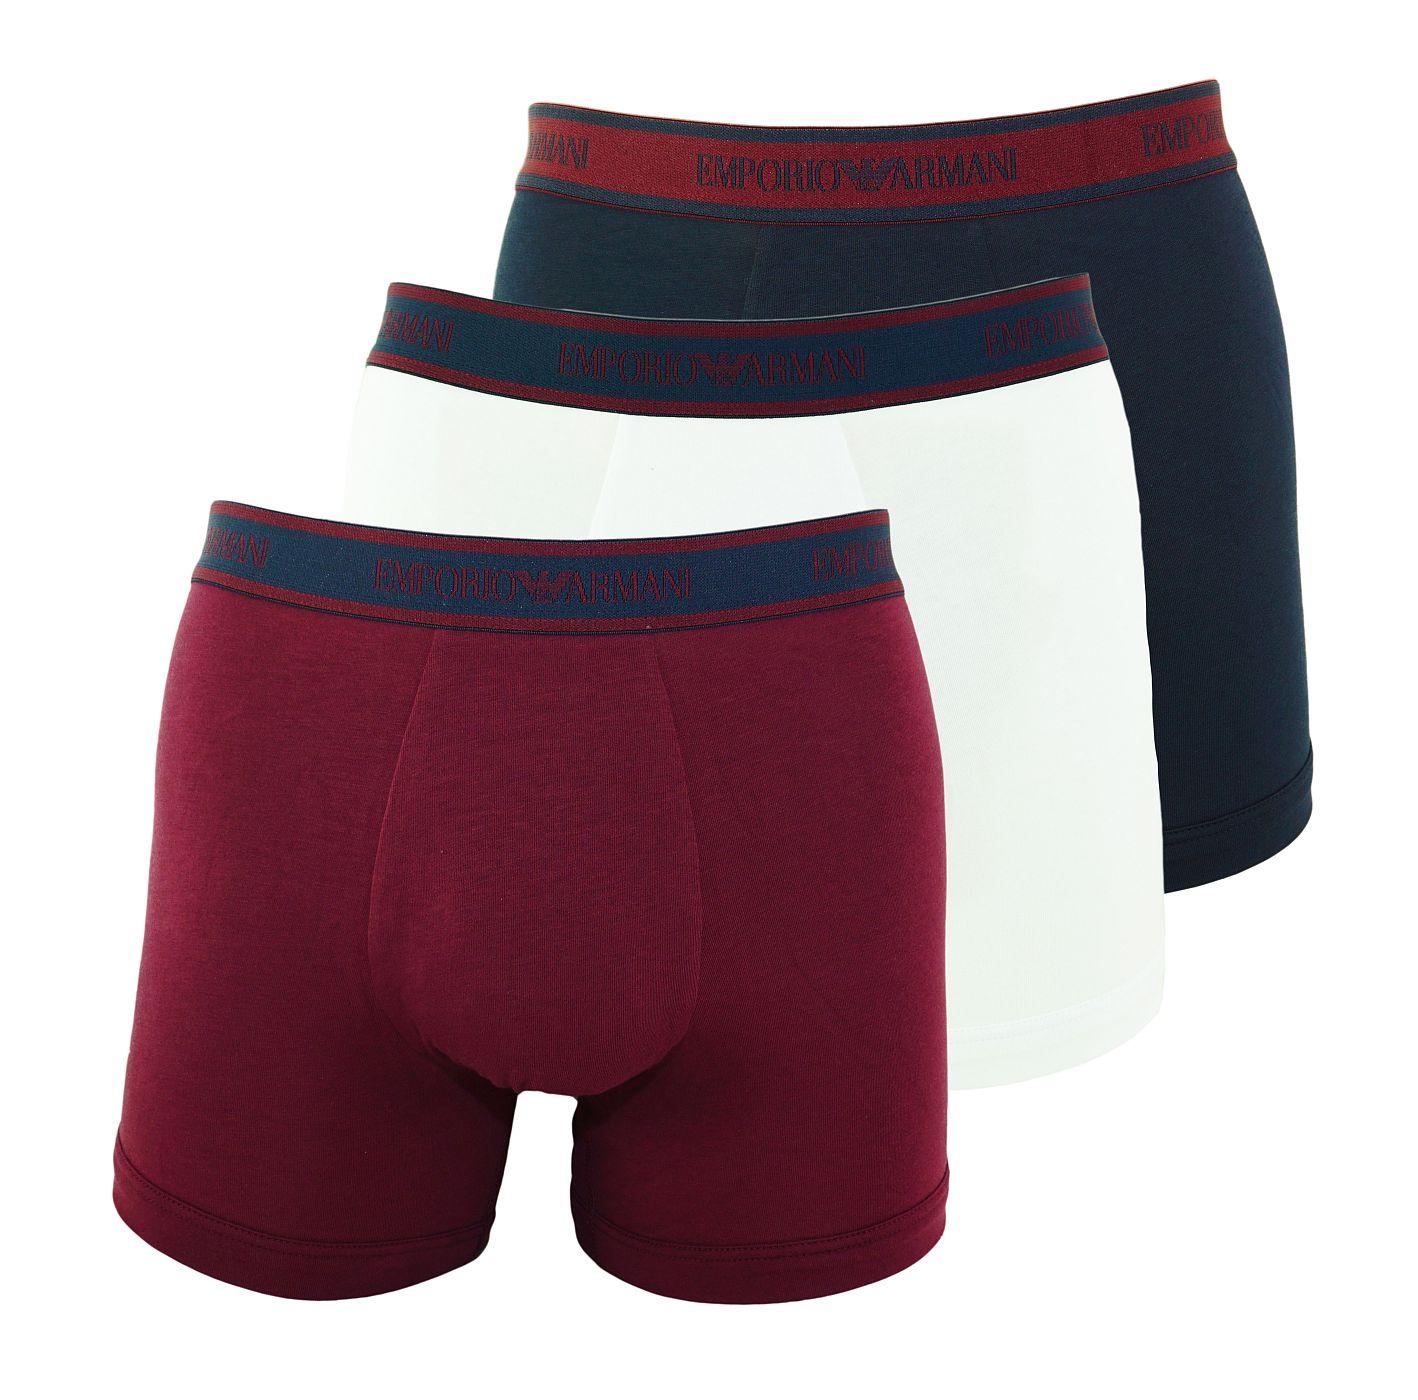 Emporio Armani 3er Pack Boxer Boxershorts 111473 8A717 54835 MARINE/MOSTO/BIANCO SH18-AB1